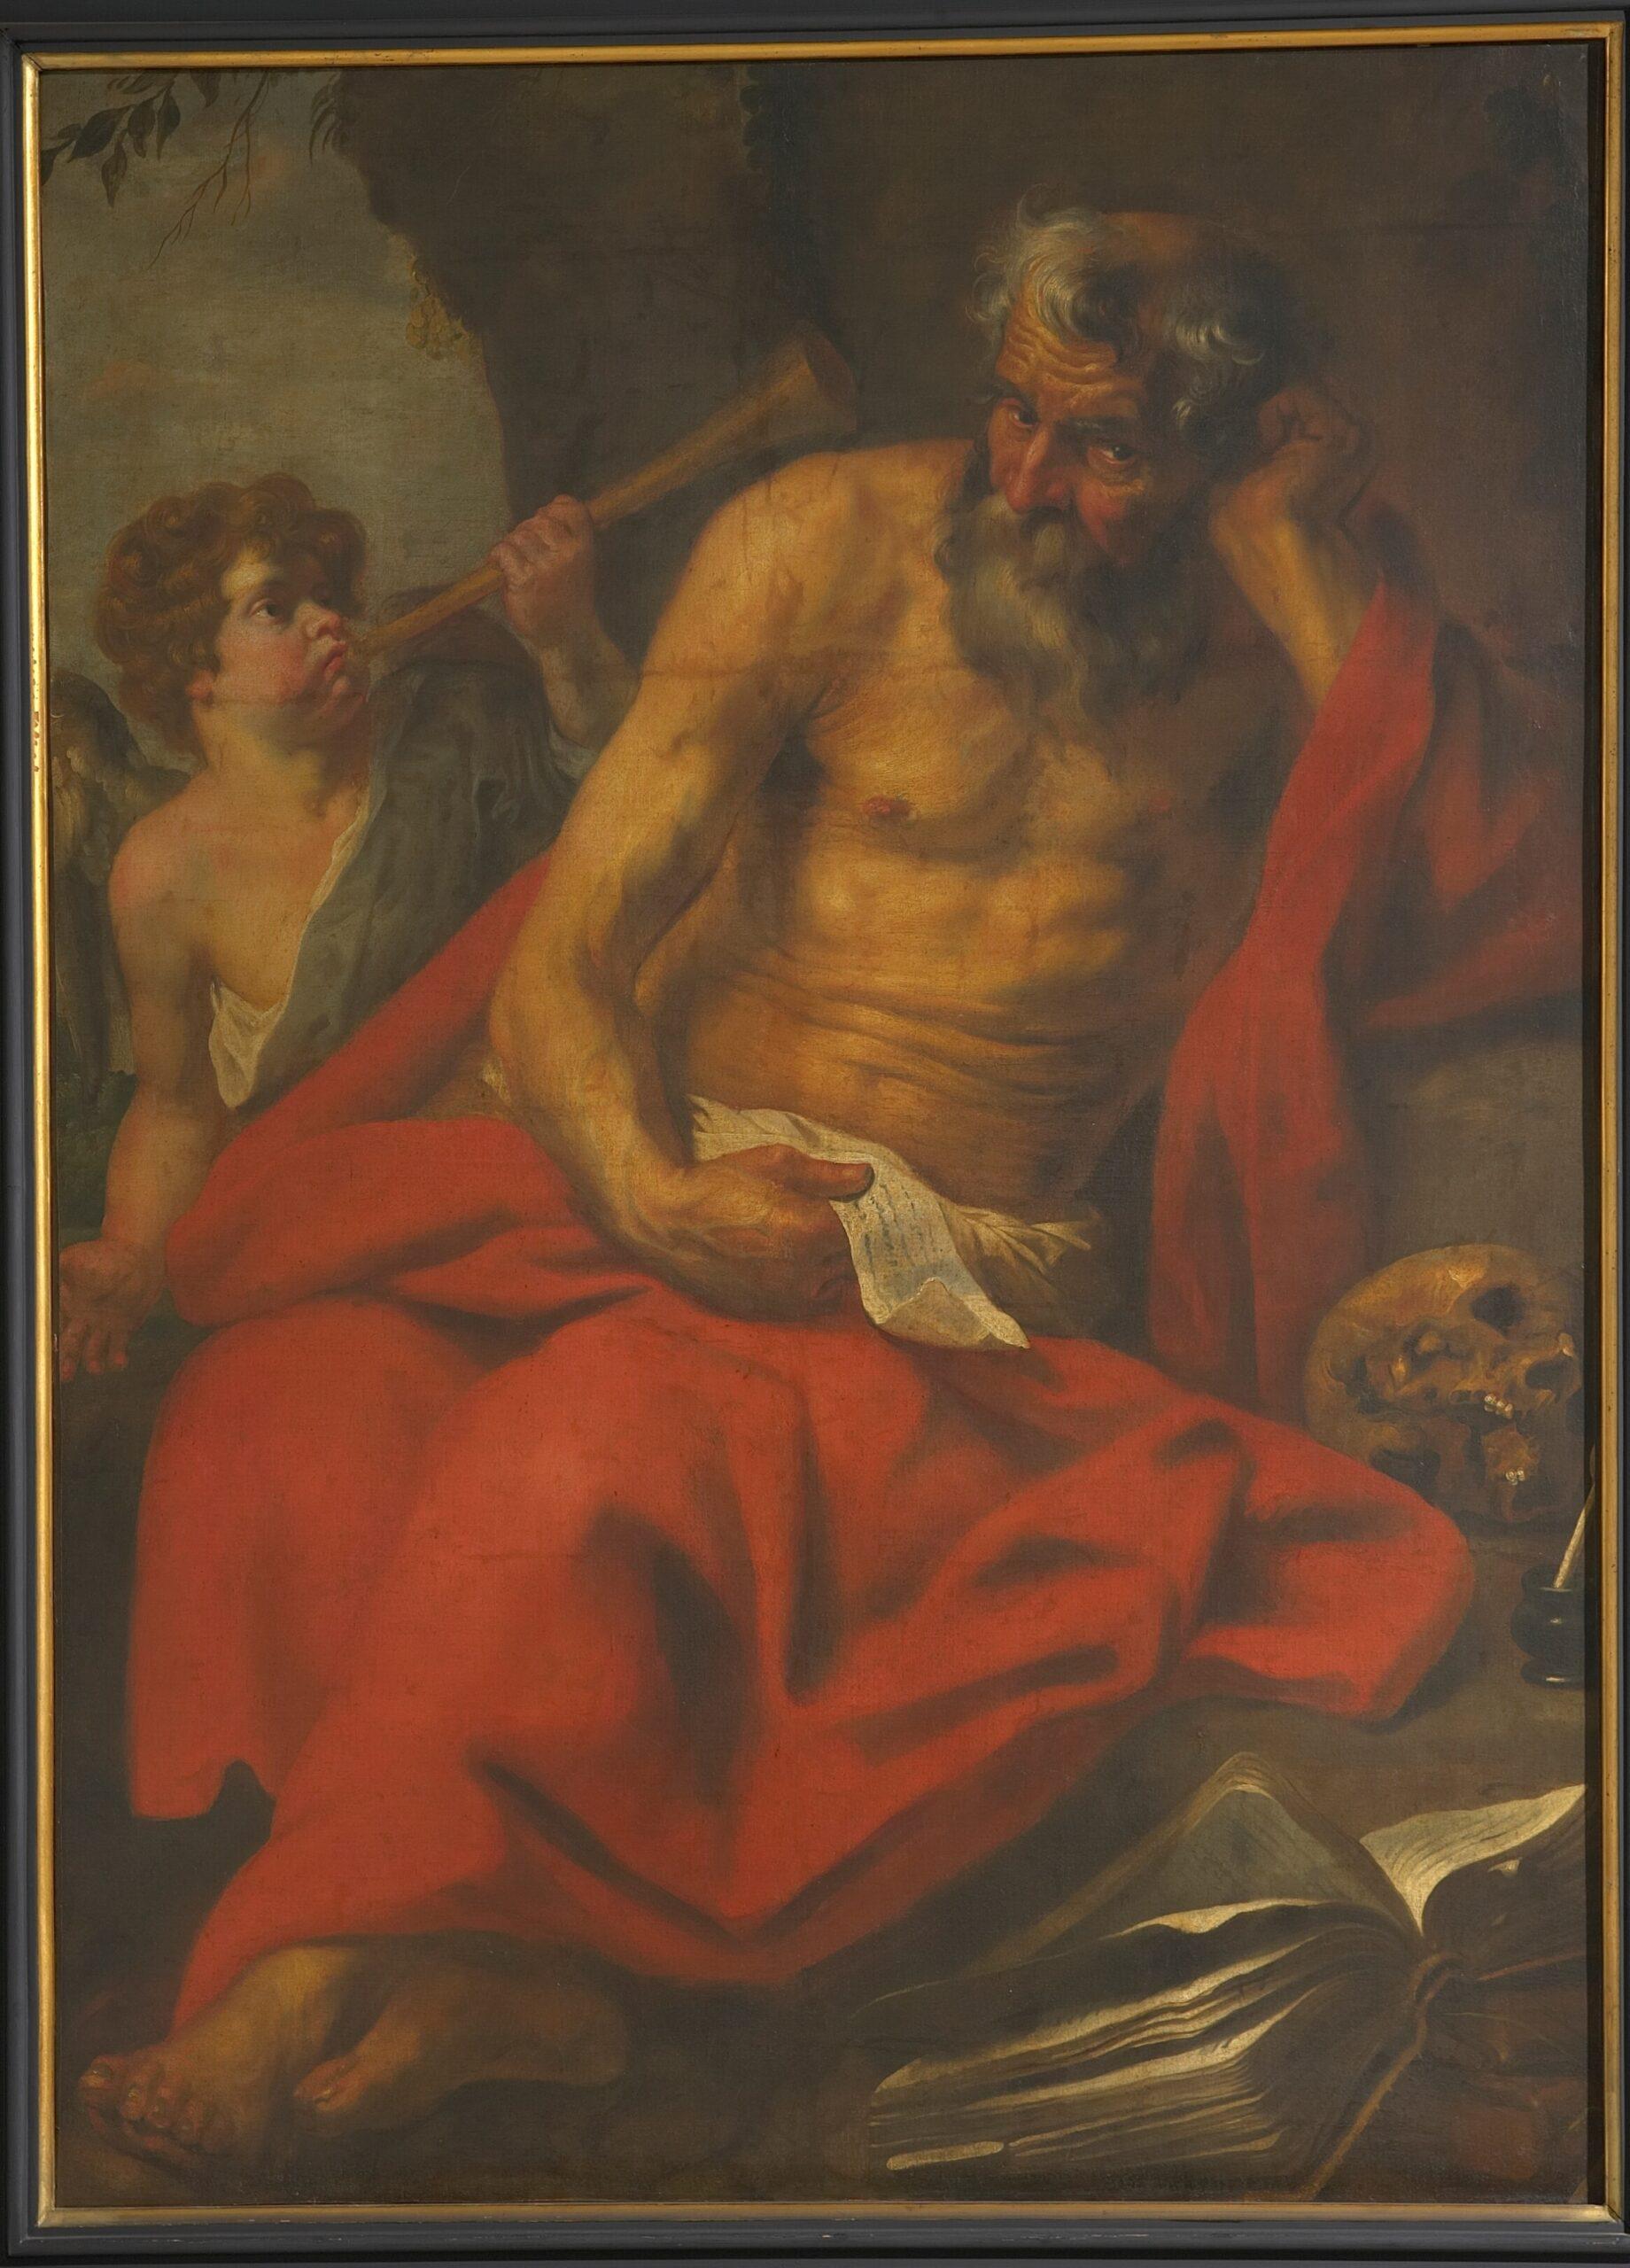 6. Follower of Anthony van Dyck, St JeromeMaagdenhuismuseum, Antwerp